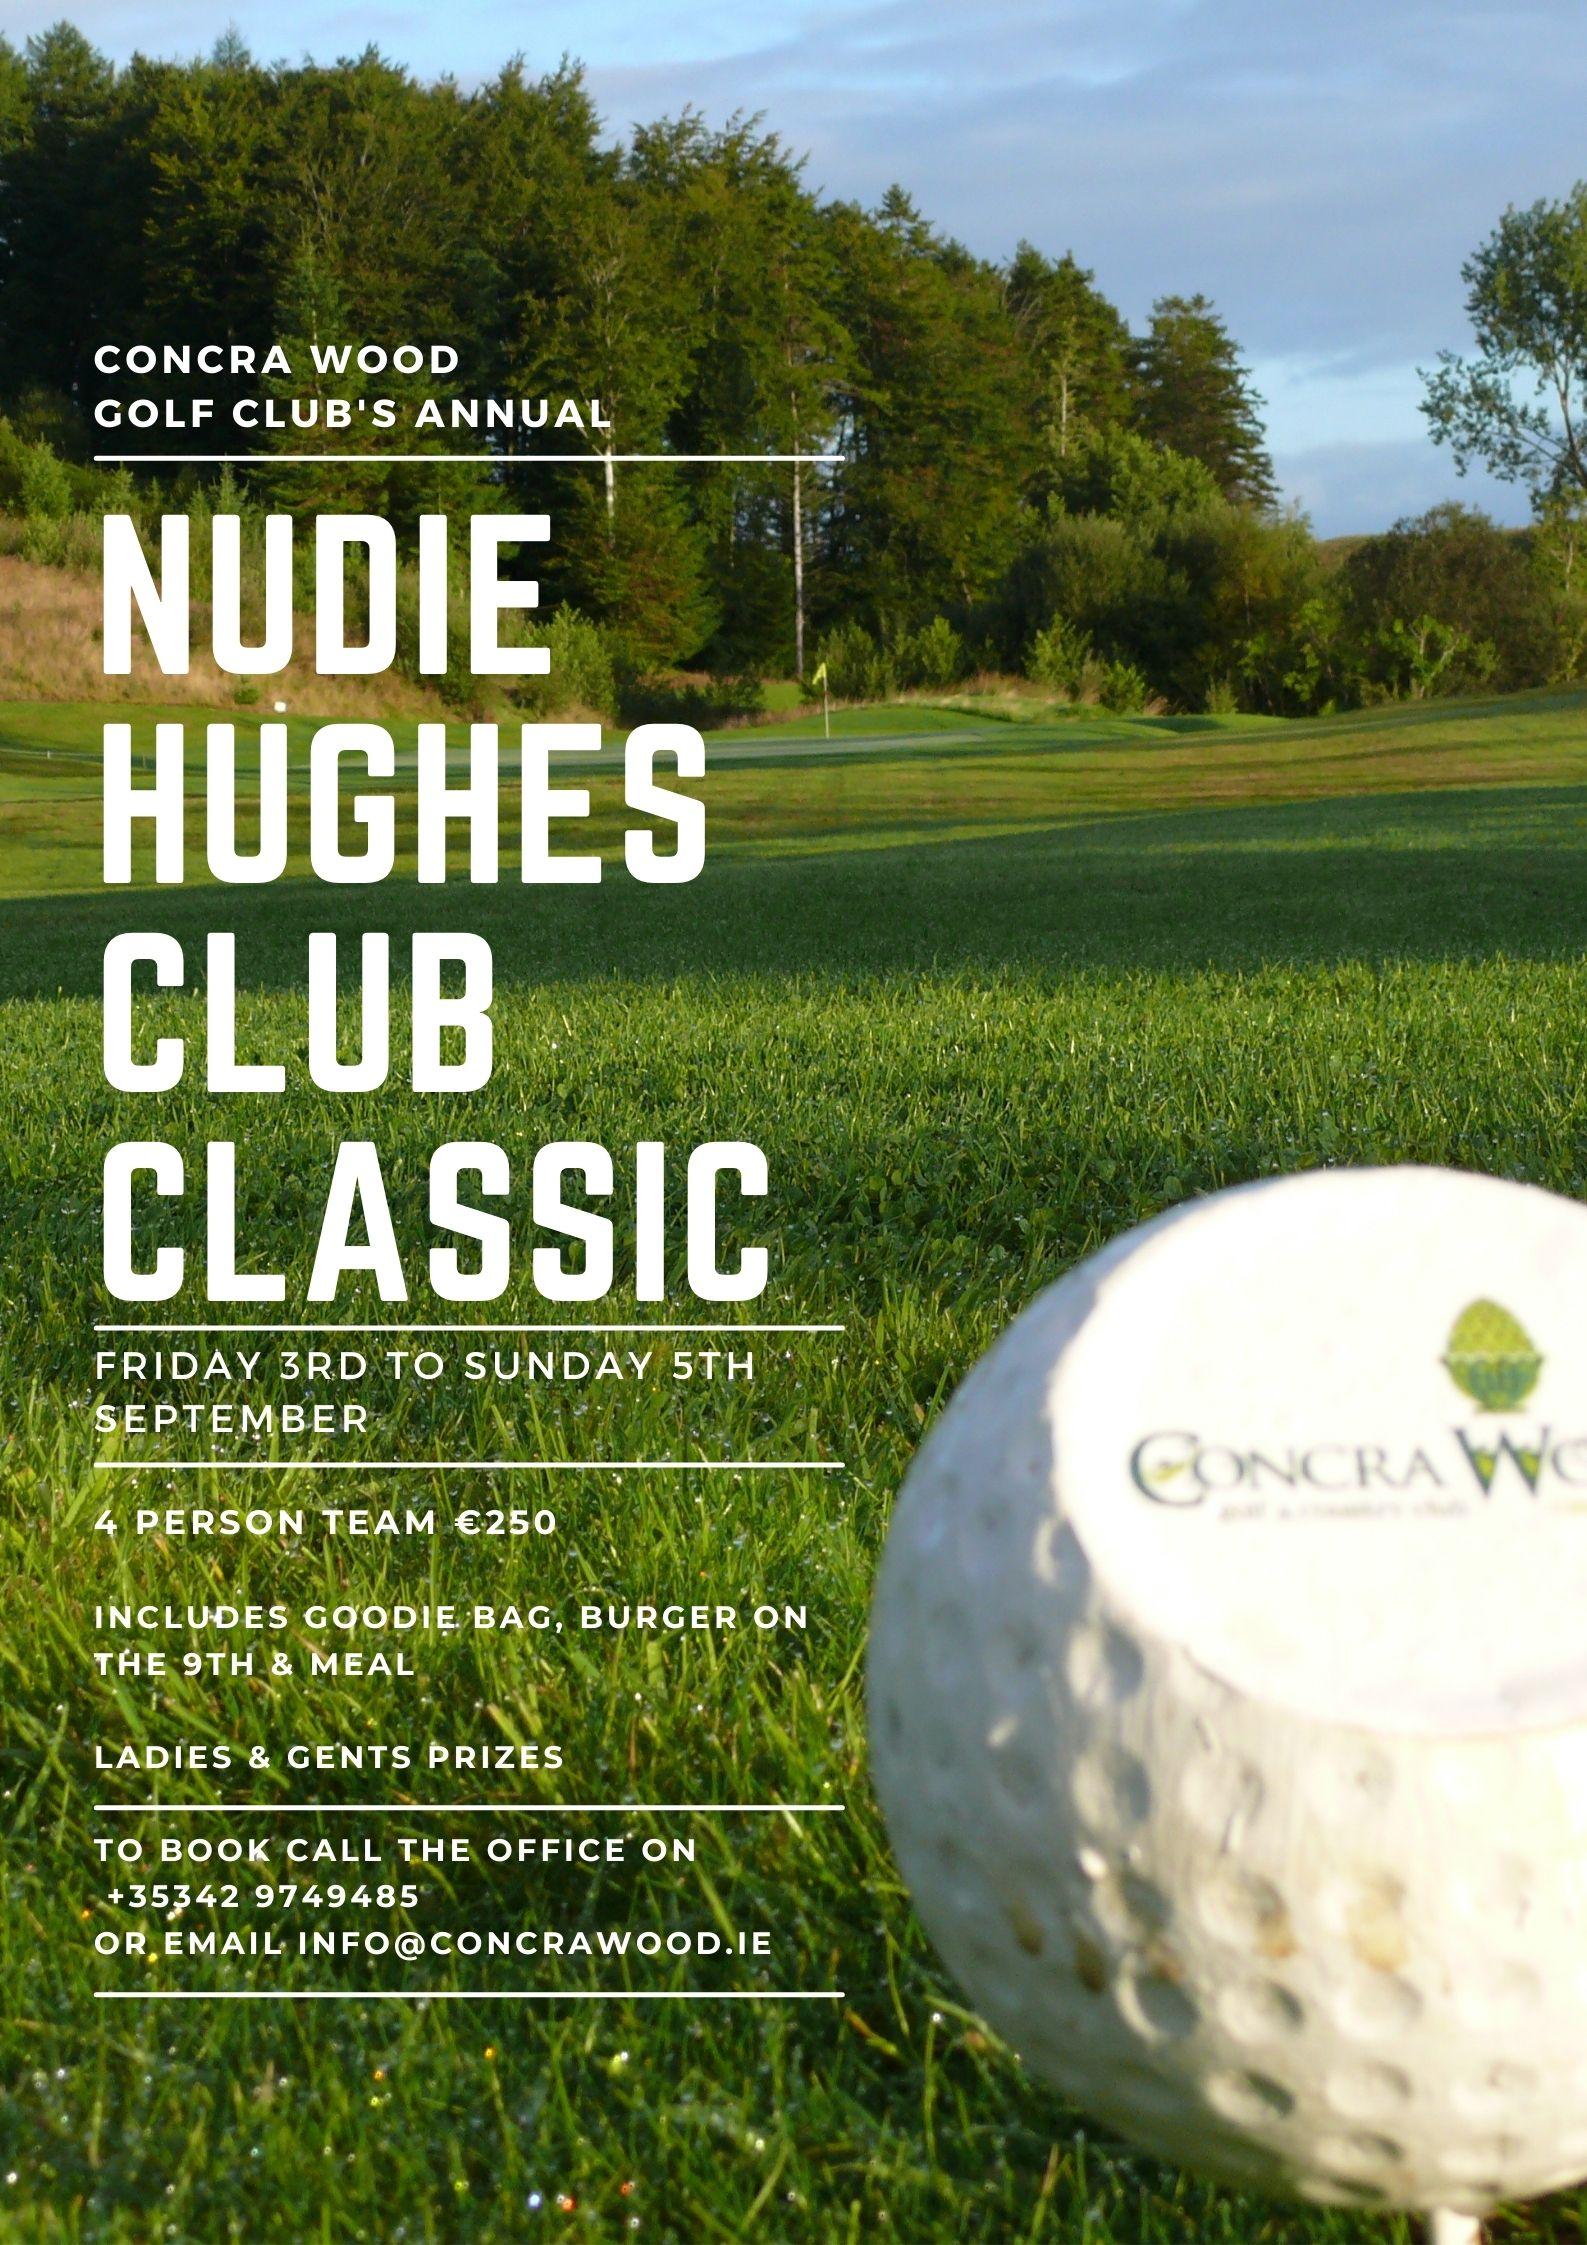 nudie hughes club classic